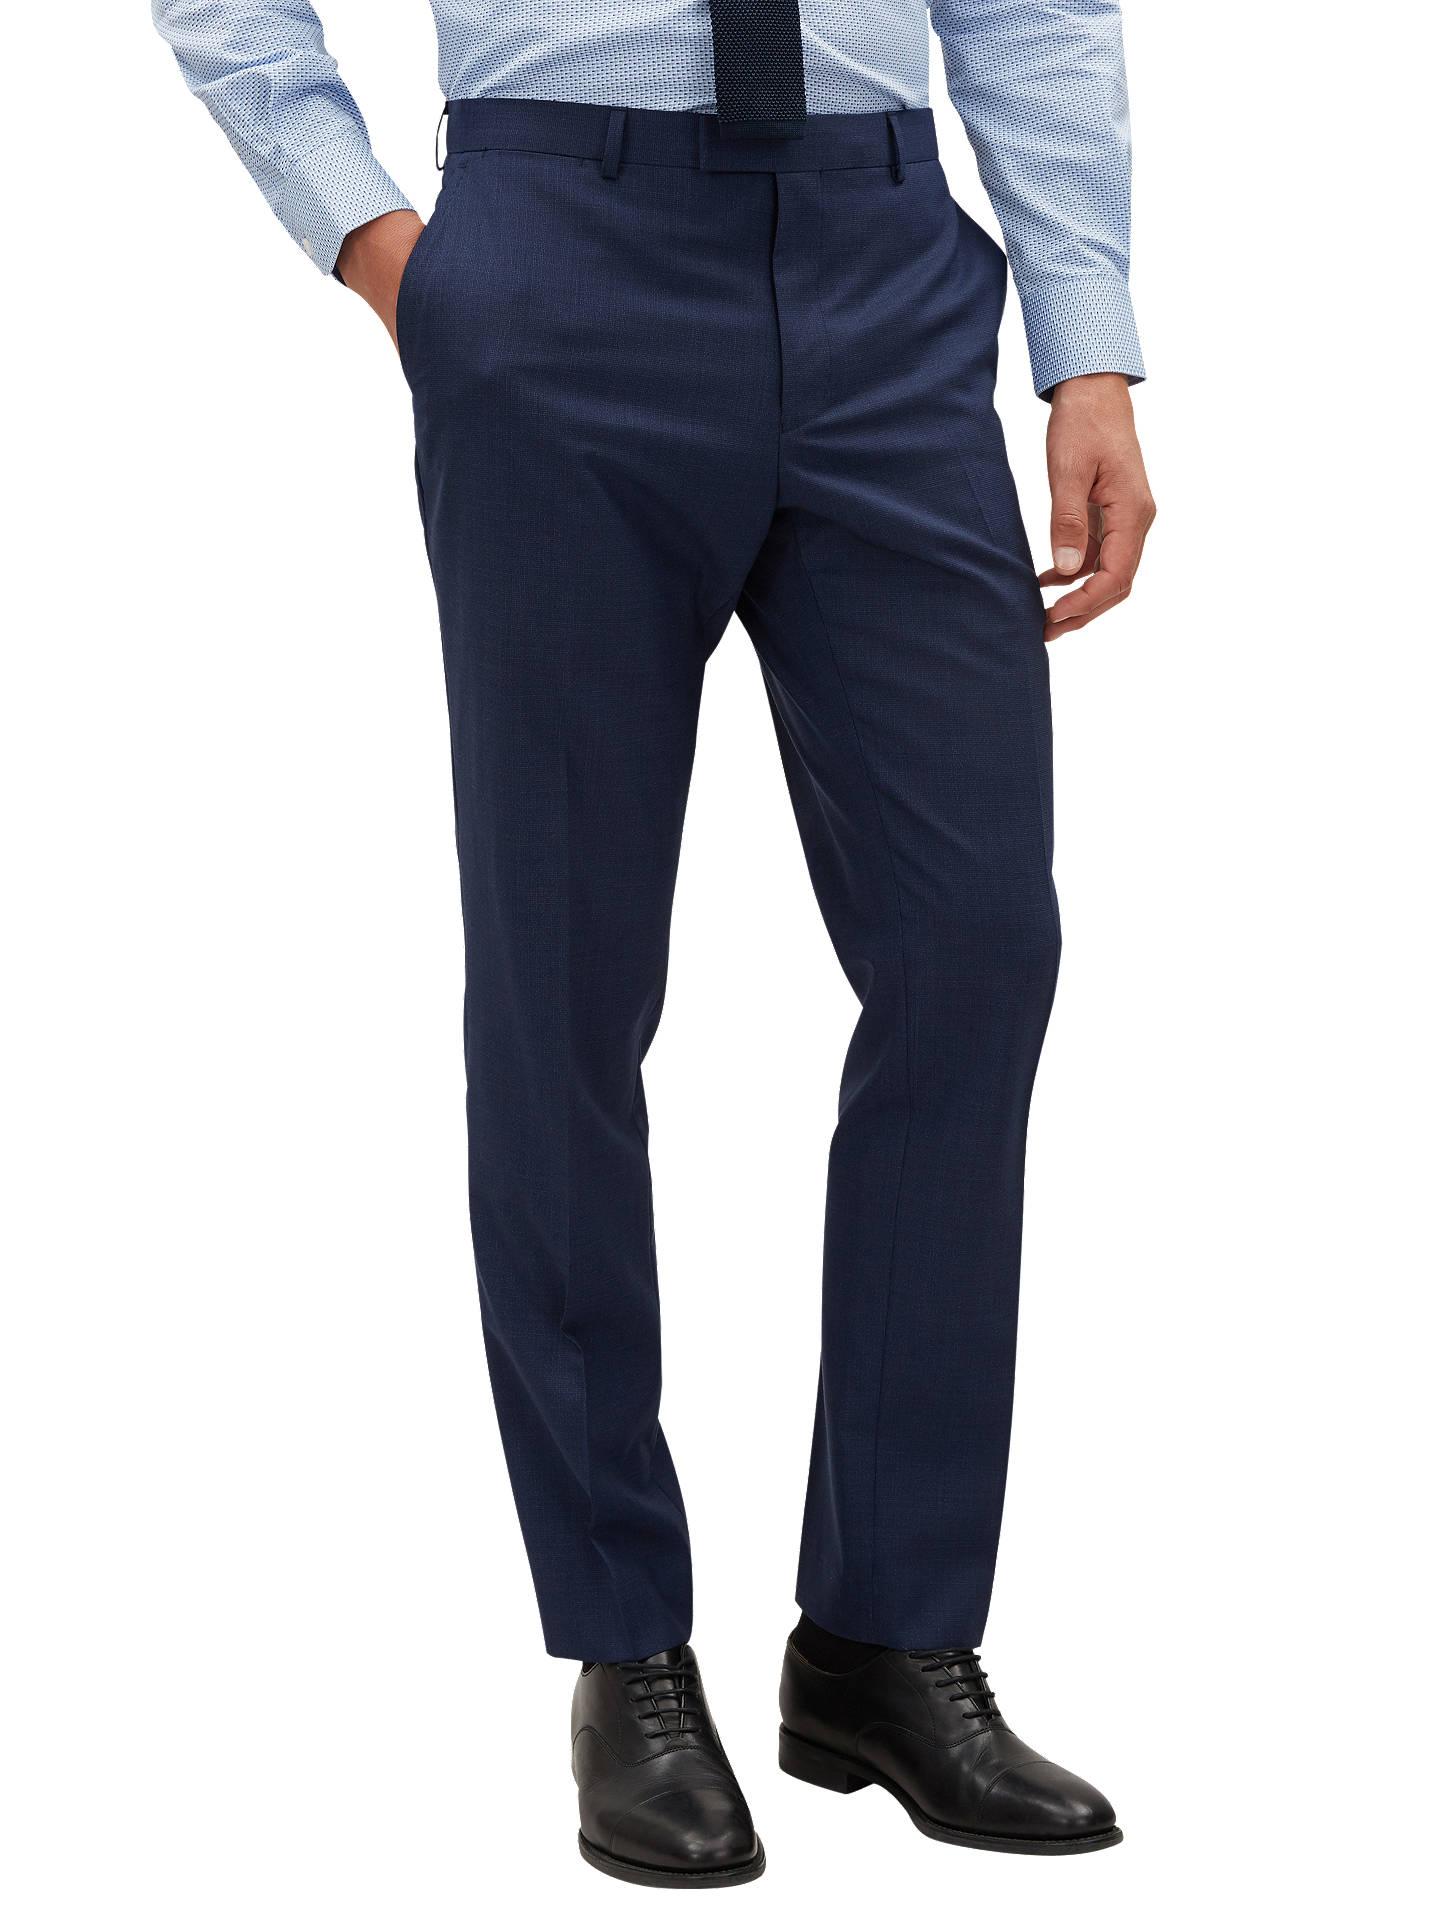 "Long leg 42/"" 46/"" 48/"" 30/"" waist mens CHEAP grey work hospital NHS NEW trousers"